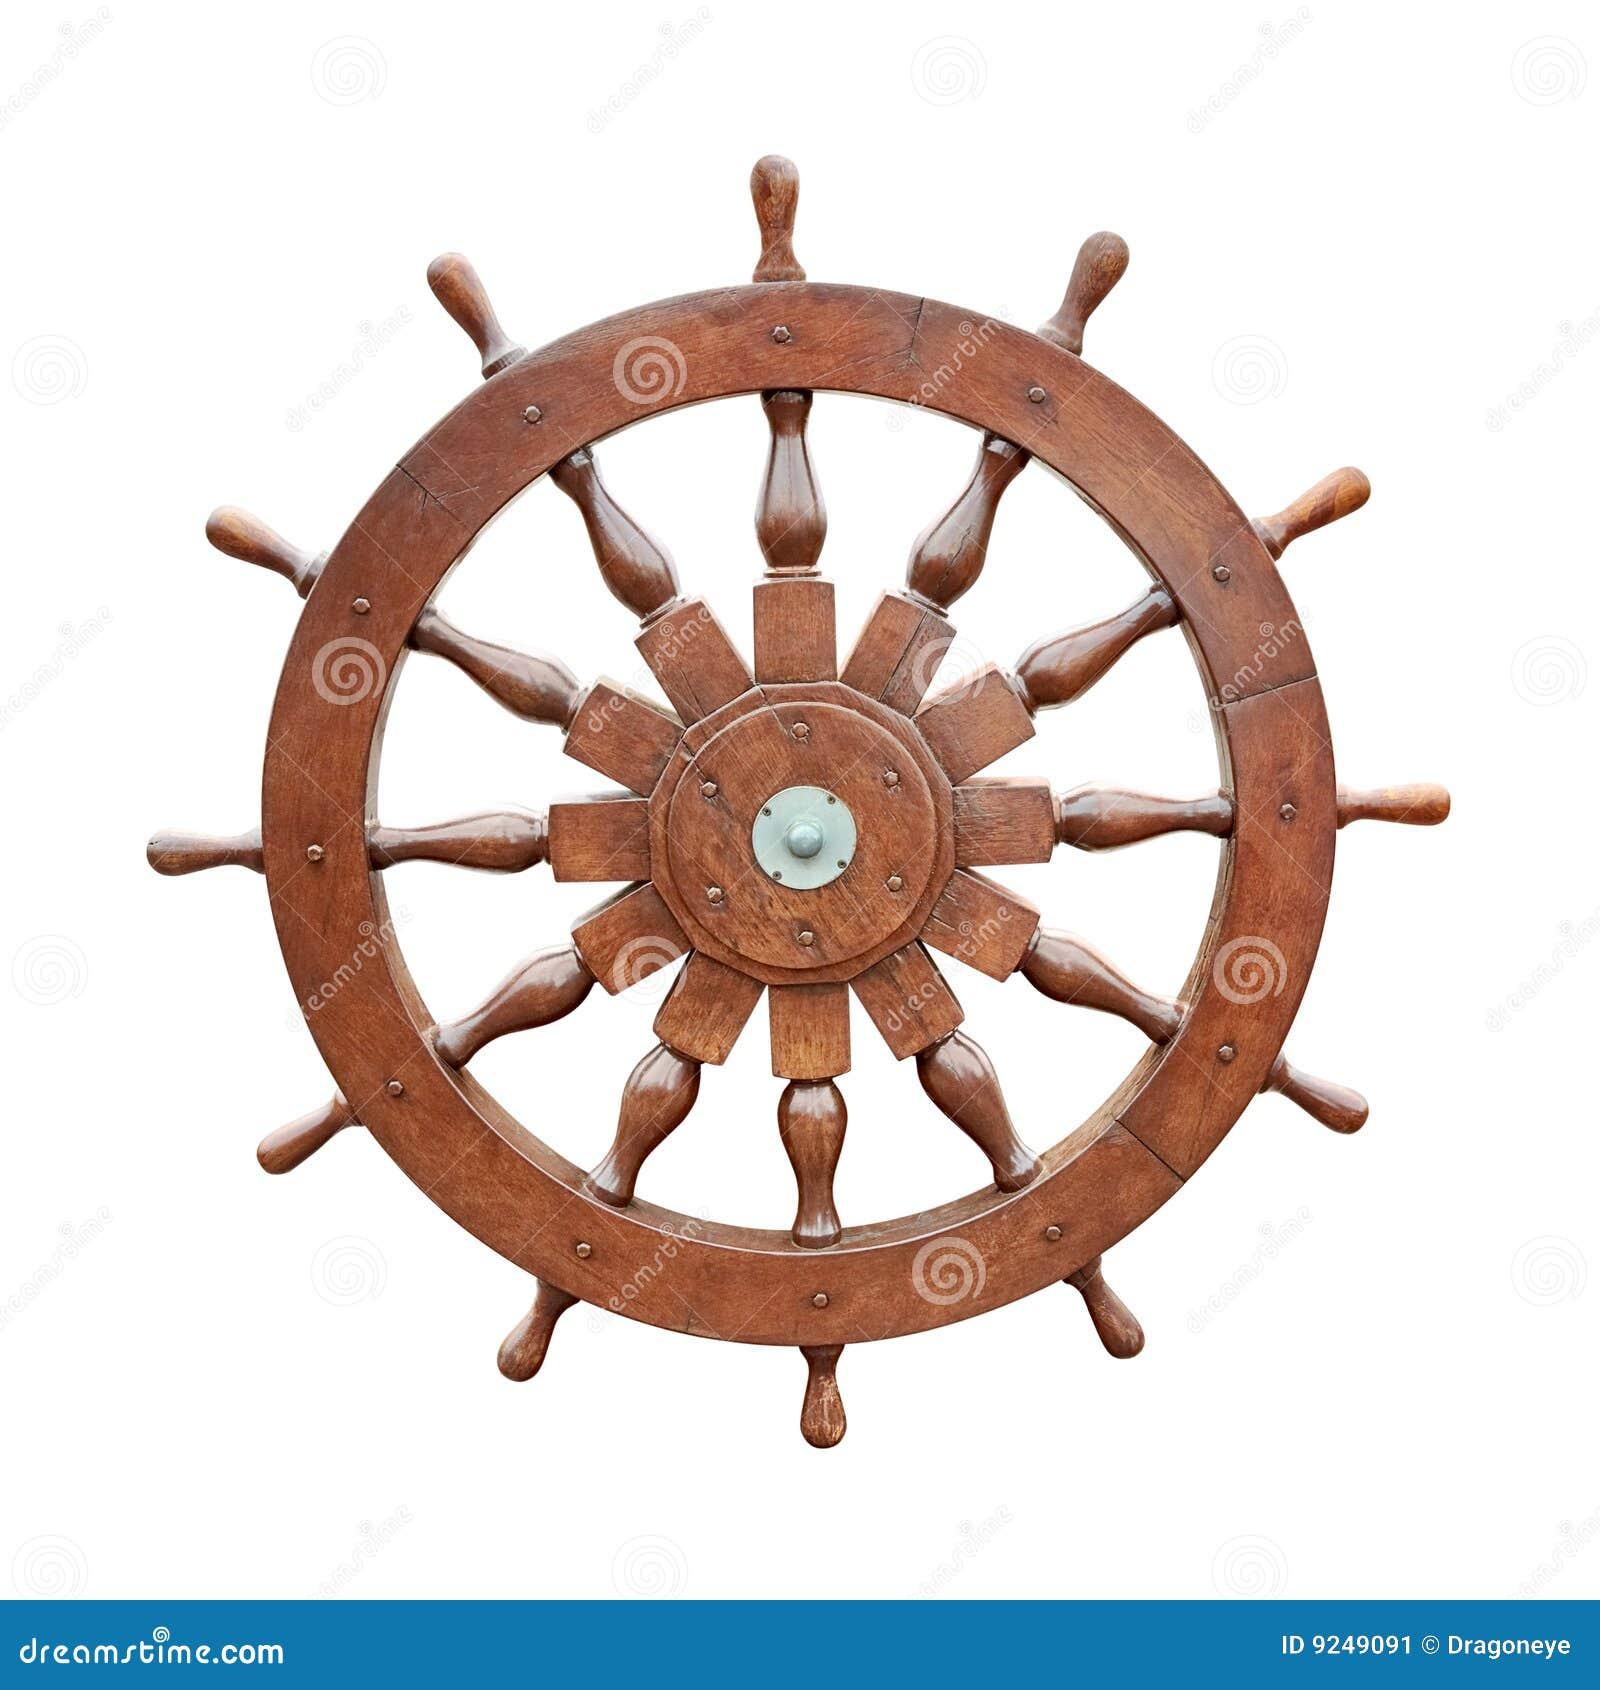 Steering wheel of sailing boat cutout